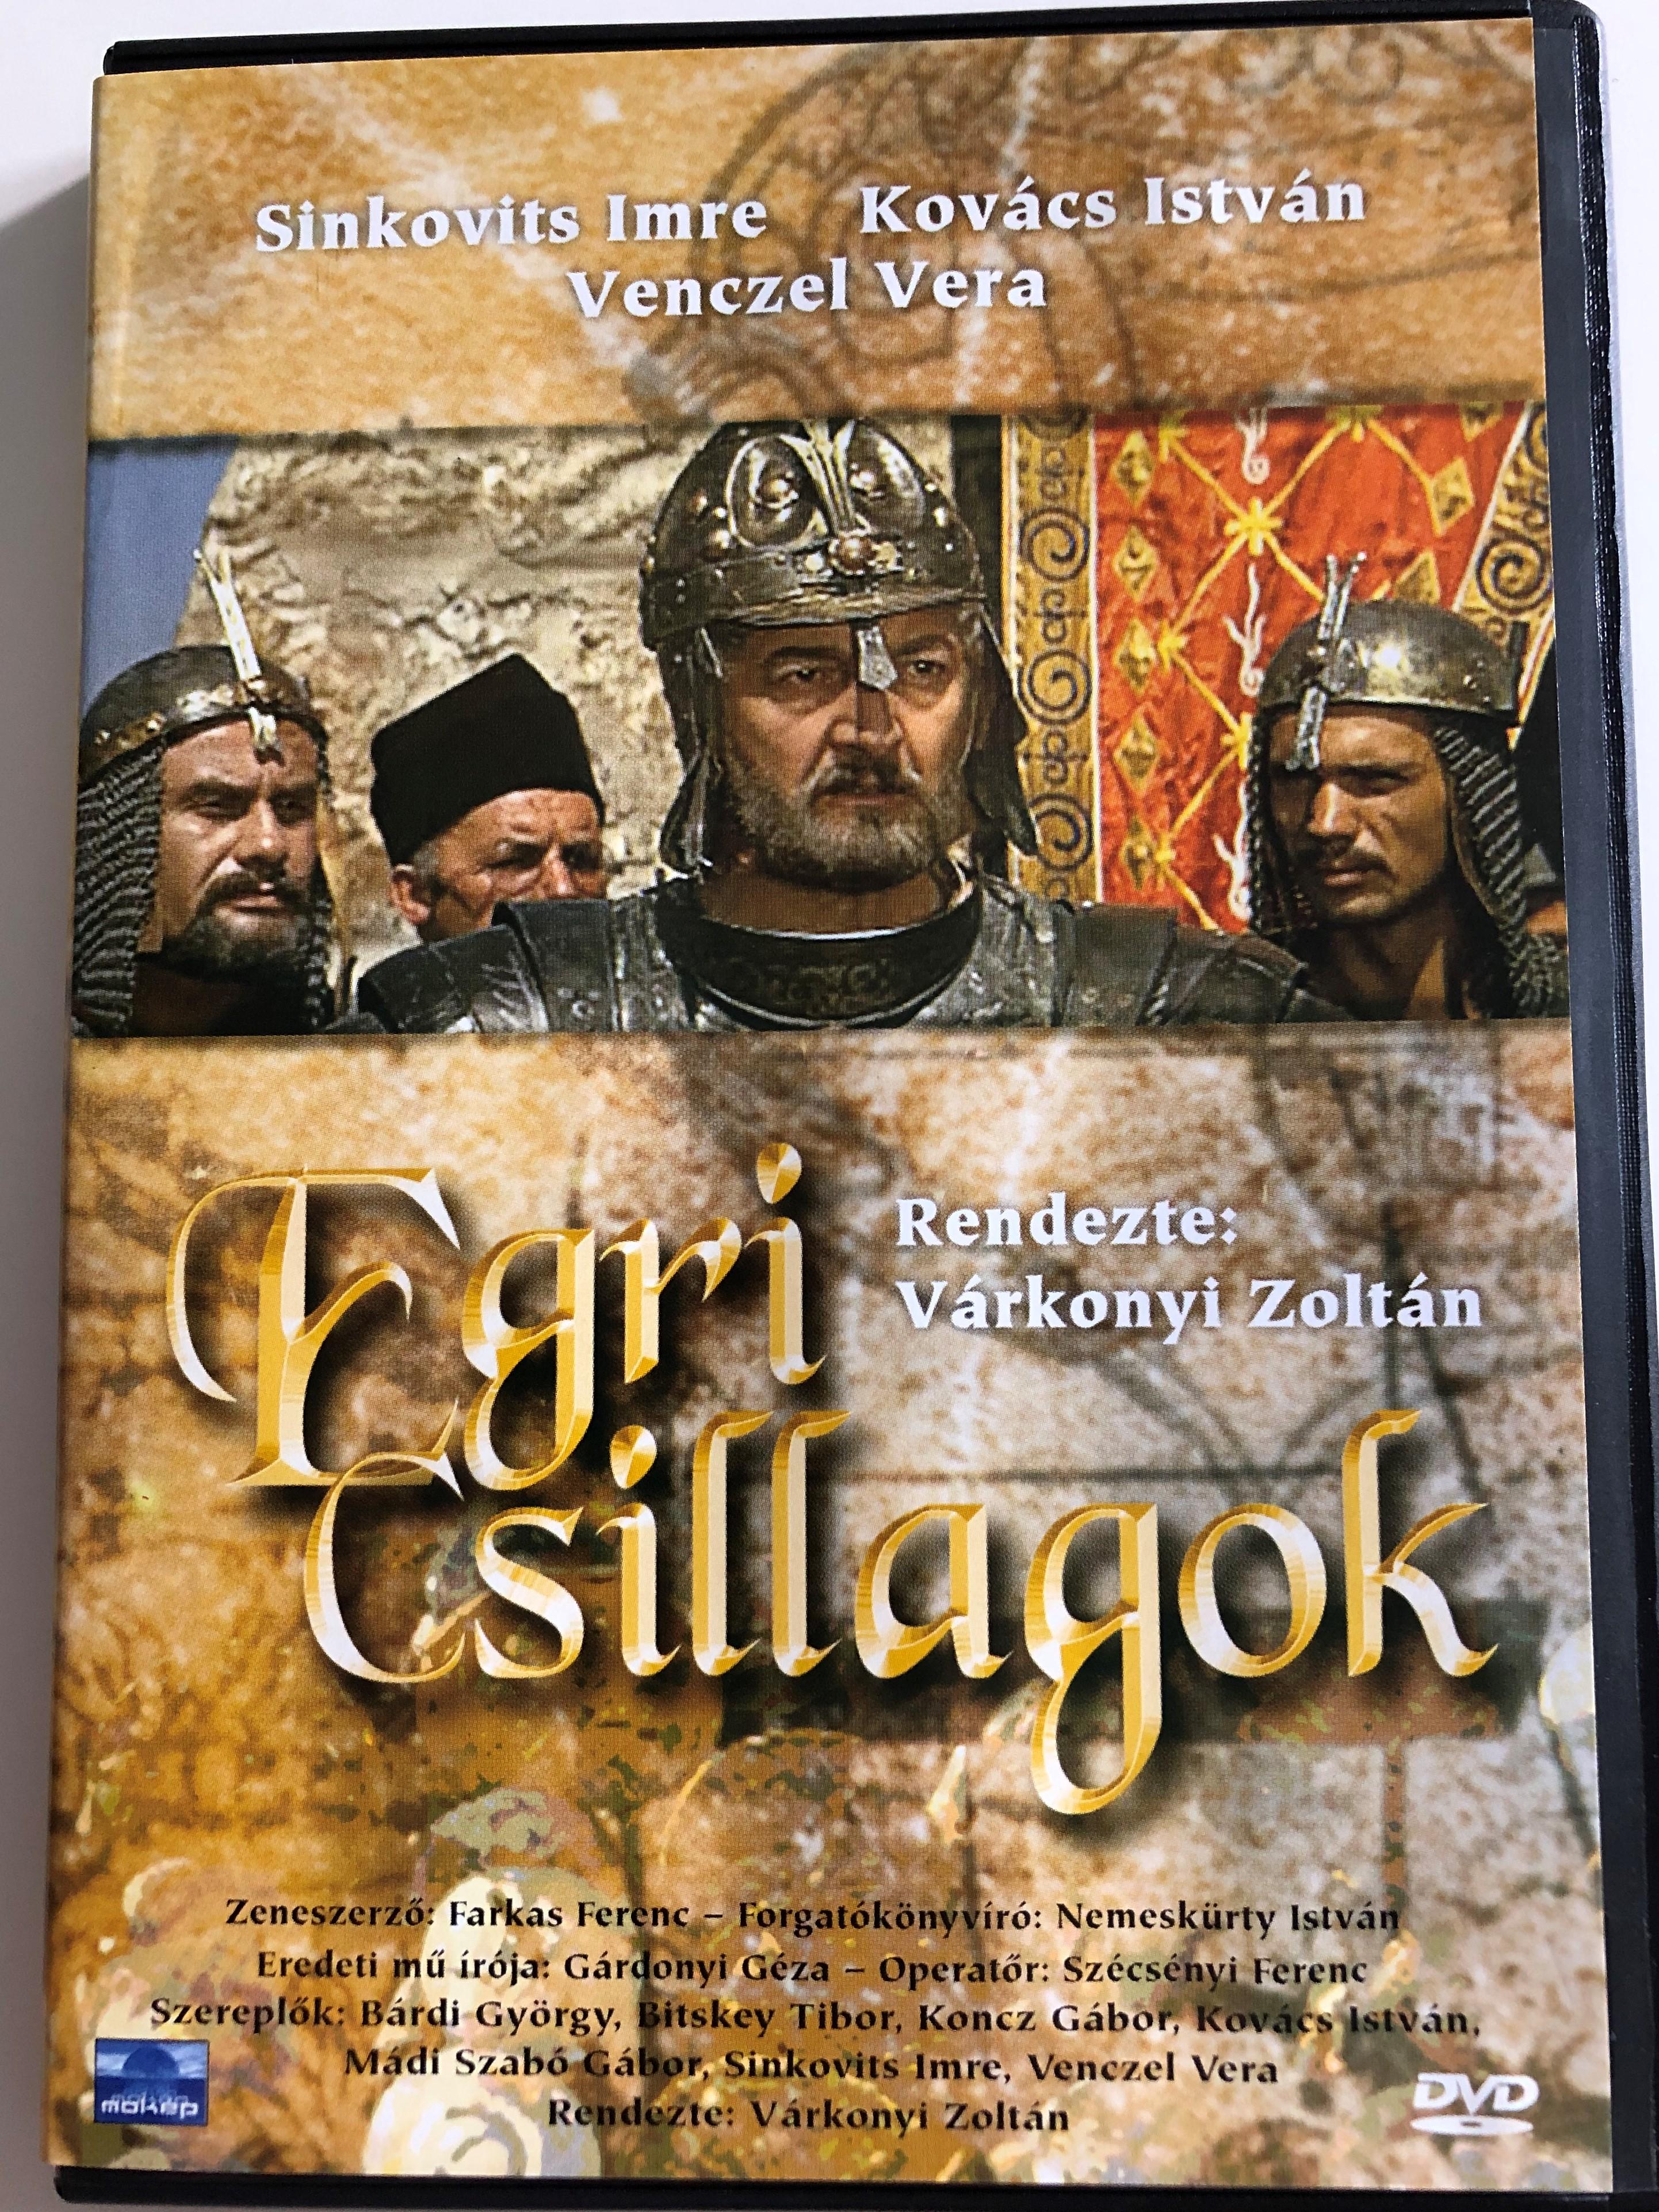 egri-csillagok-dvd-1968-eclipse-of-the-crescent-moon-directed-by-v-rkonyi-zolt-n-starring-sinkovits-imre-kov-cs-istv-n-venczel-vera-hungarian-classic-film-based-on-popular-literary-work-1-.jpg